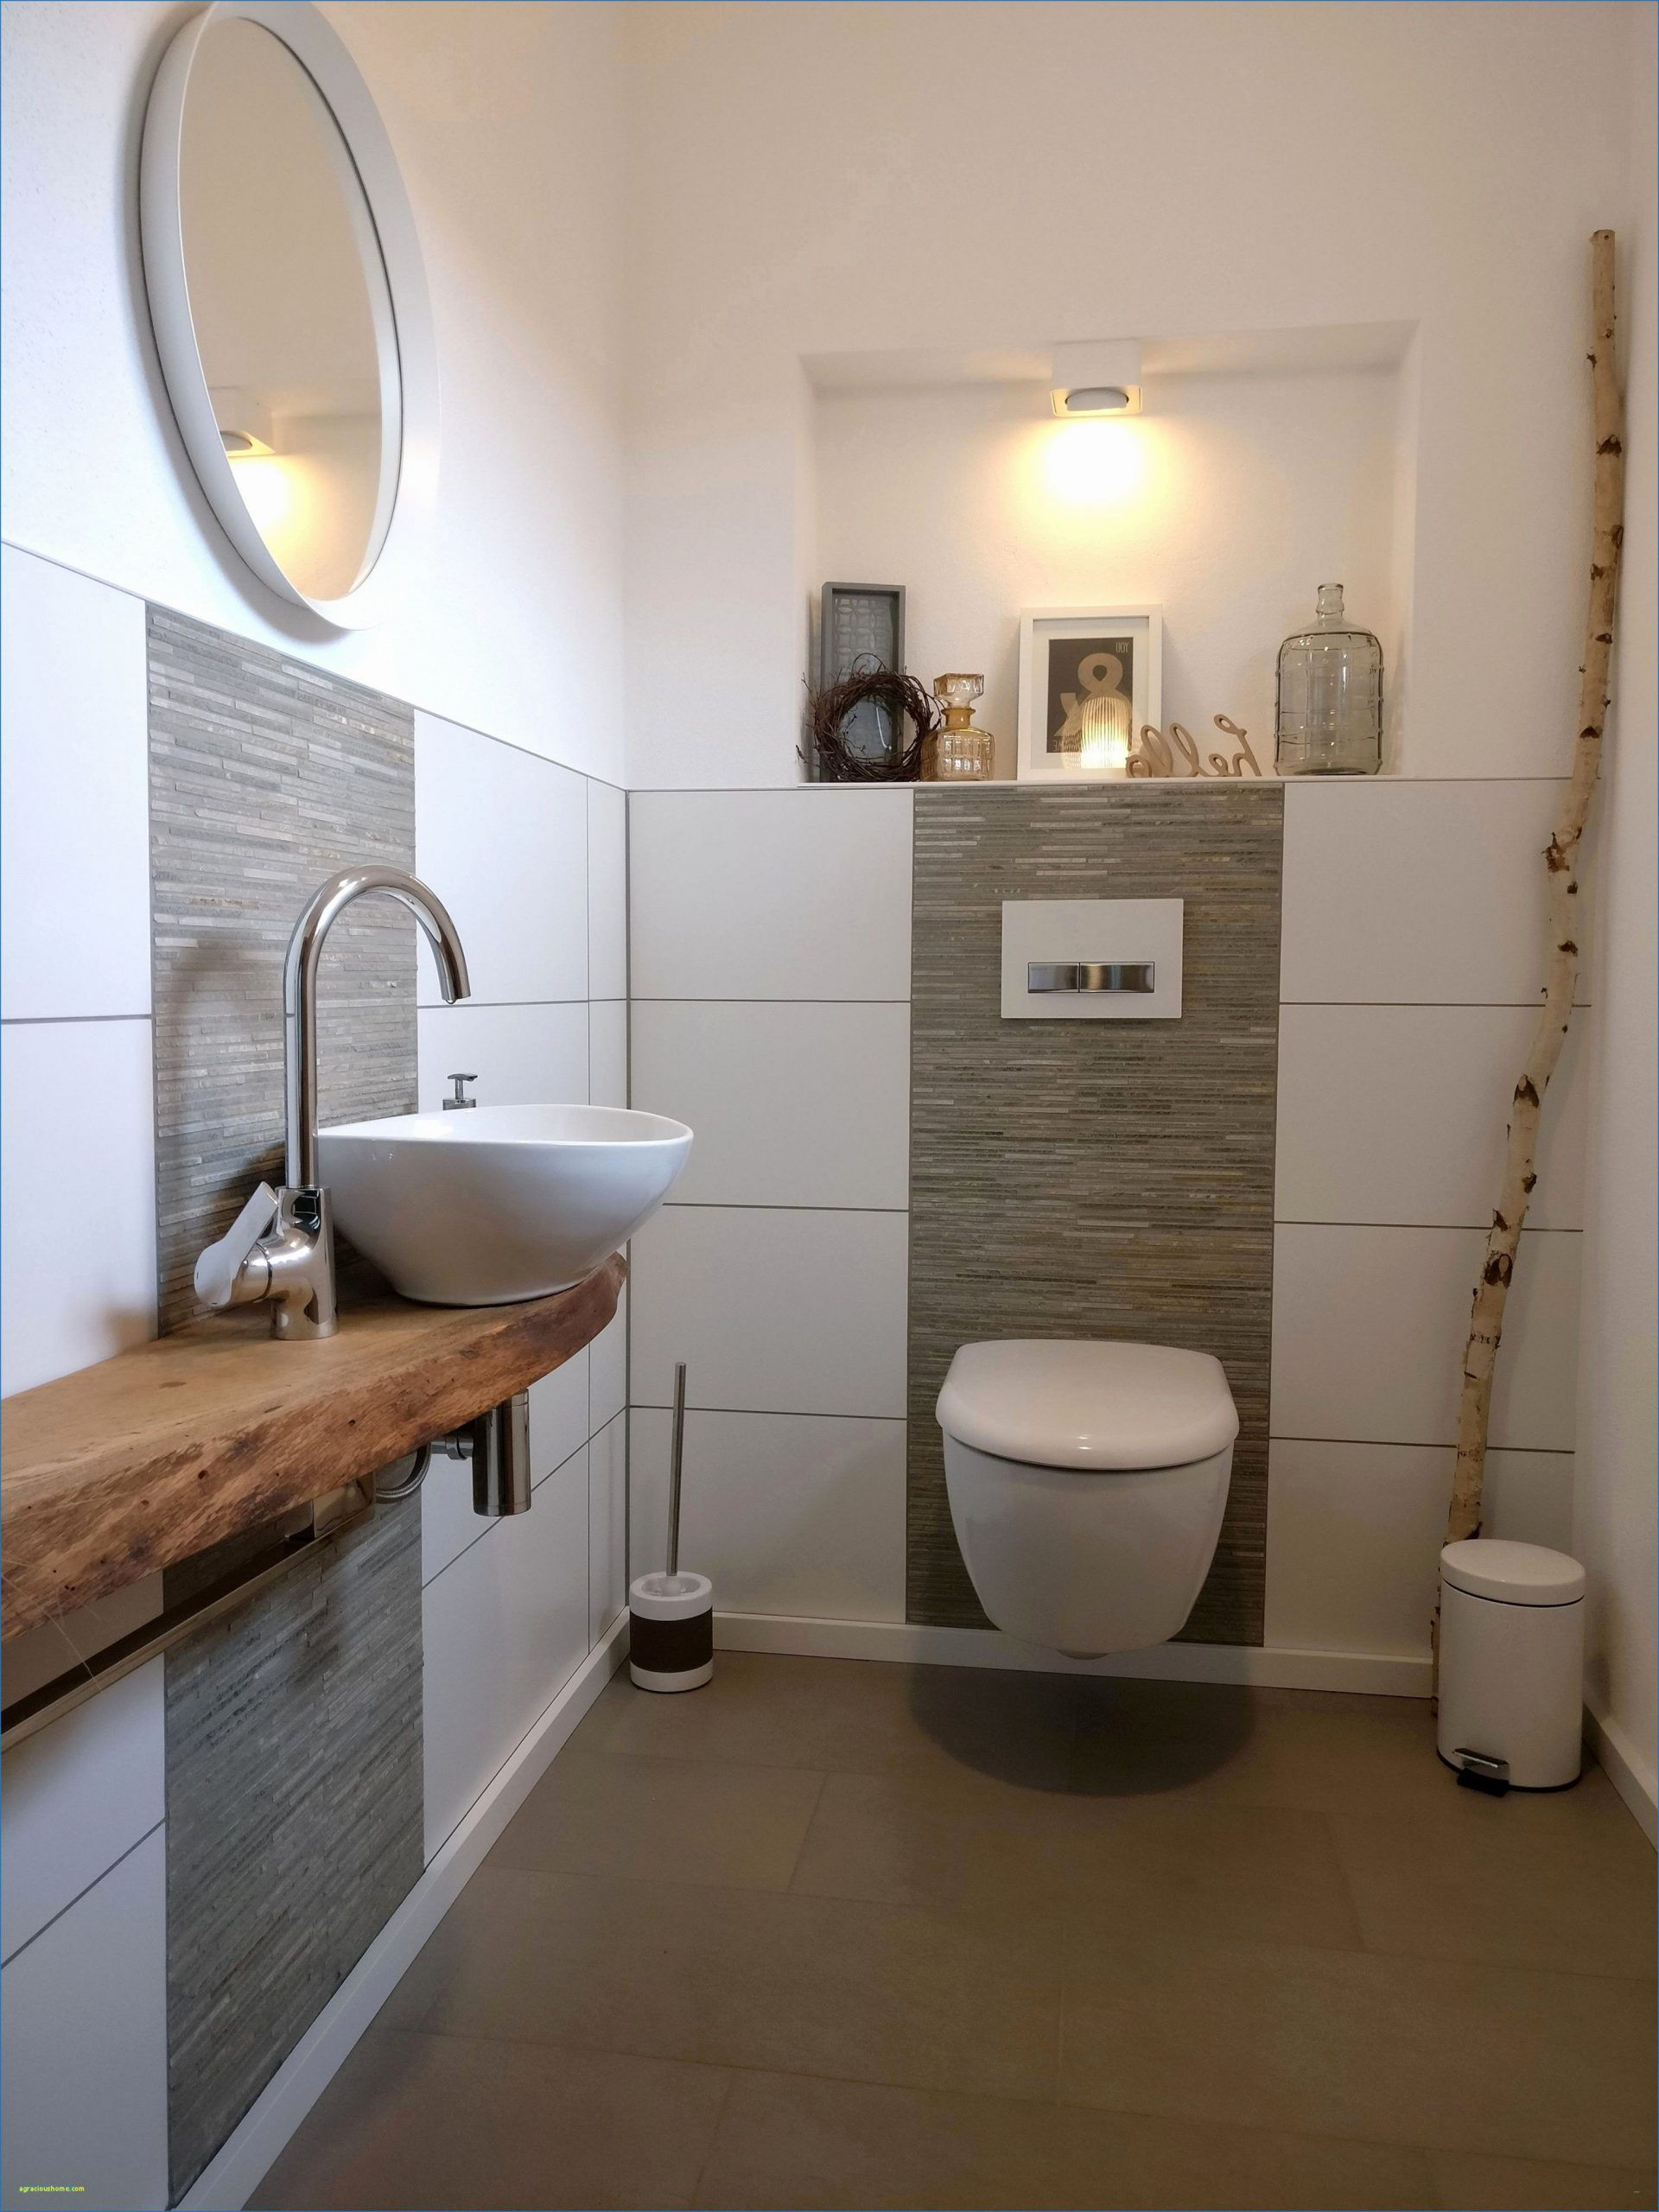 Small Bathrooms Bathroom Ideas From Small Bathroom Renovate Ideas Image Bathroom Bathrooms Ideas Image In 2020 Small Bathroom Bathroom Renovations Bathroom Design